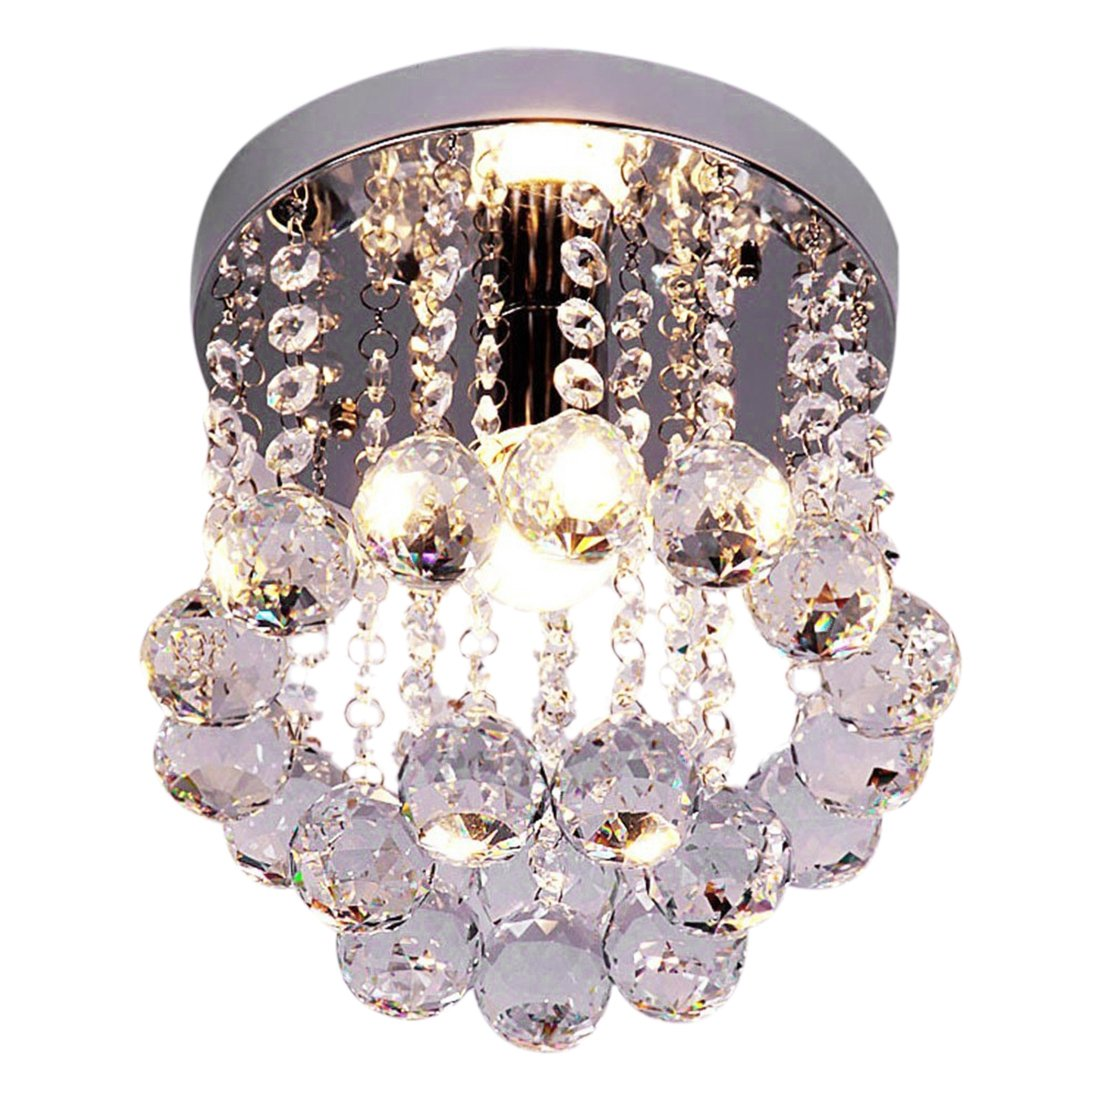 Retro Ceiling Light - TOOGOO(R) Retro Luxury Flush Mount Crystal Pendant Ceiling Light Chandelier Lighting HQ